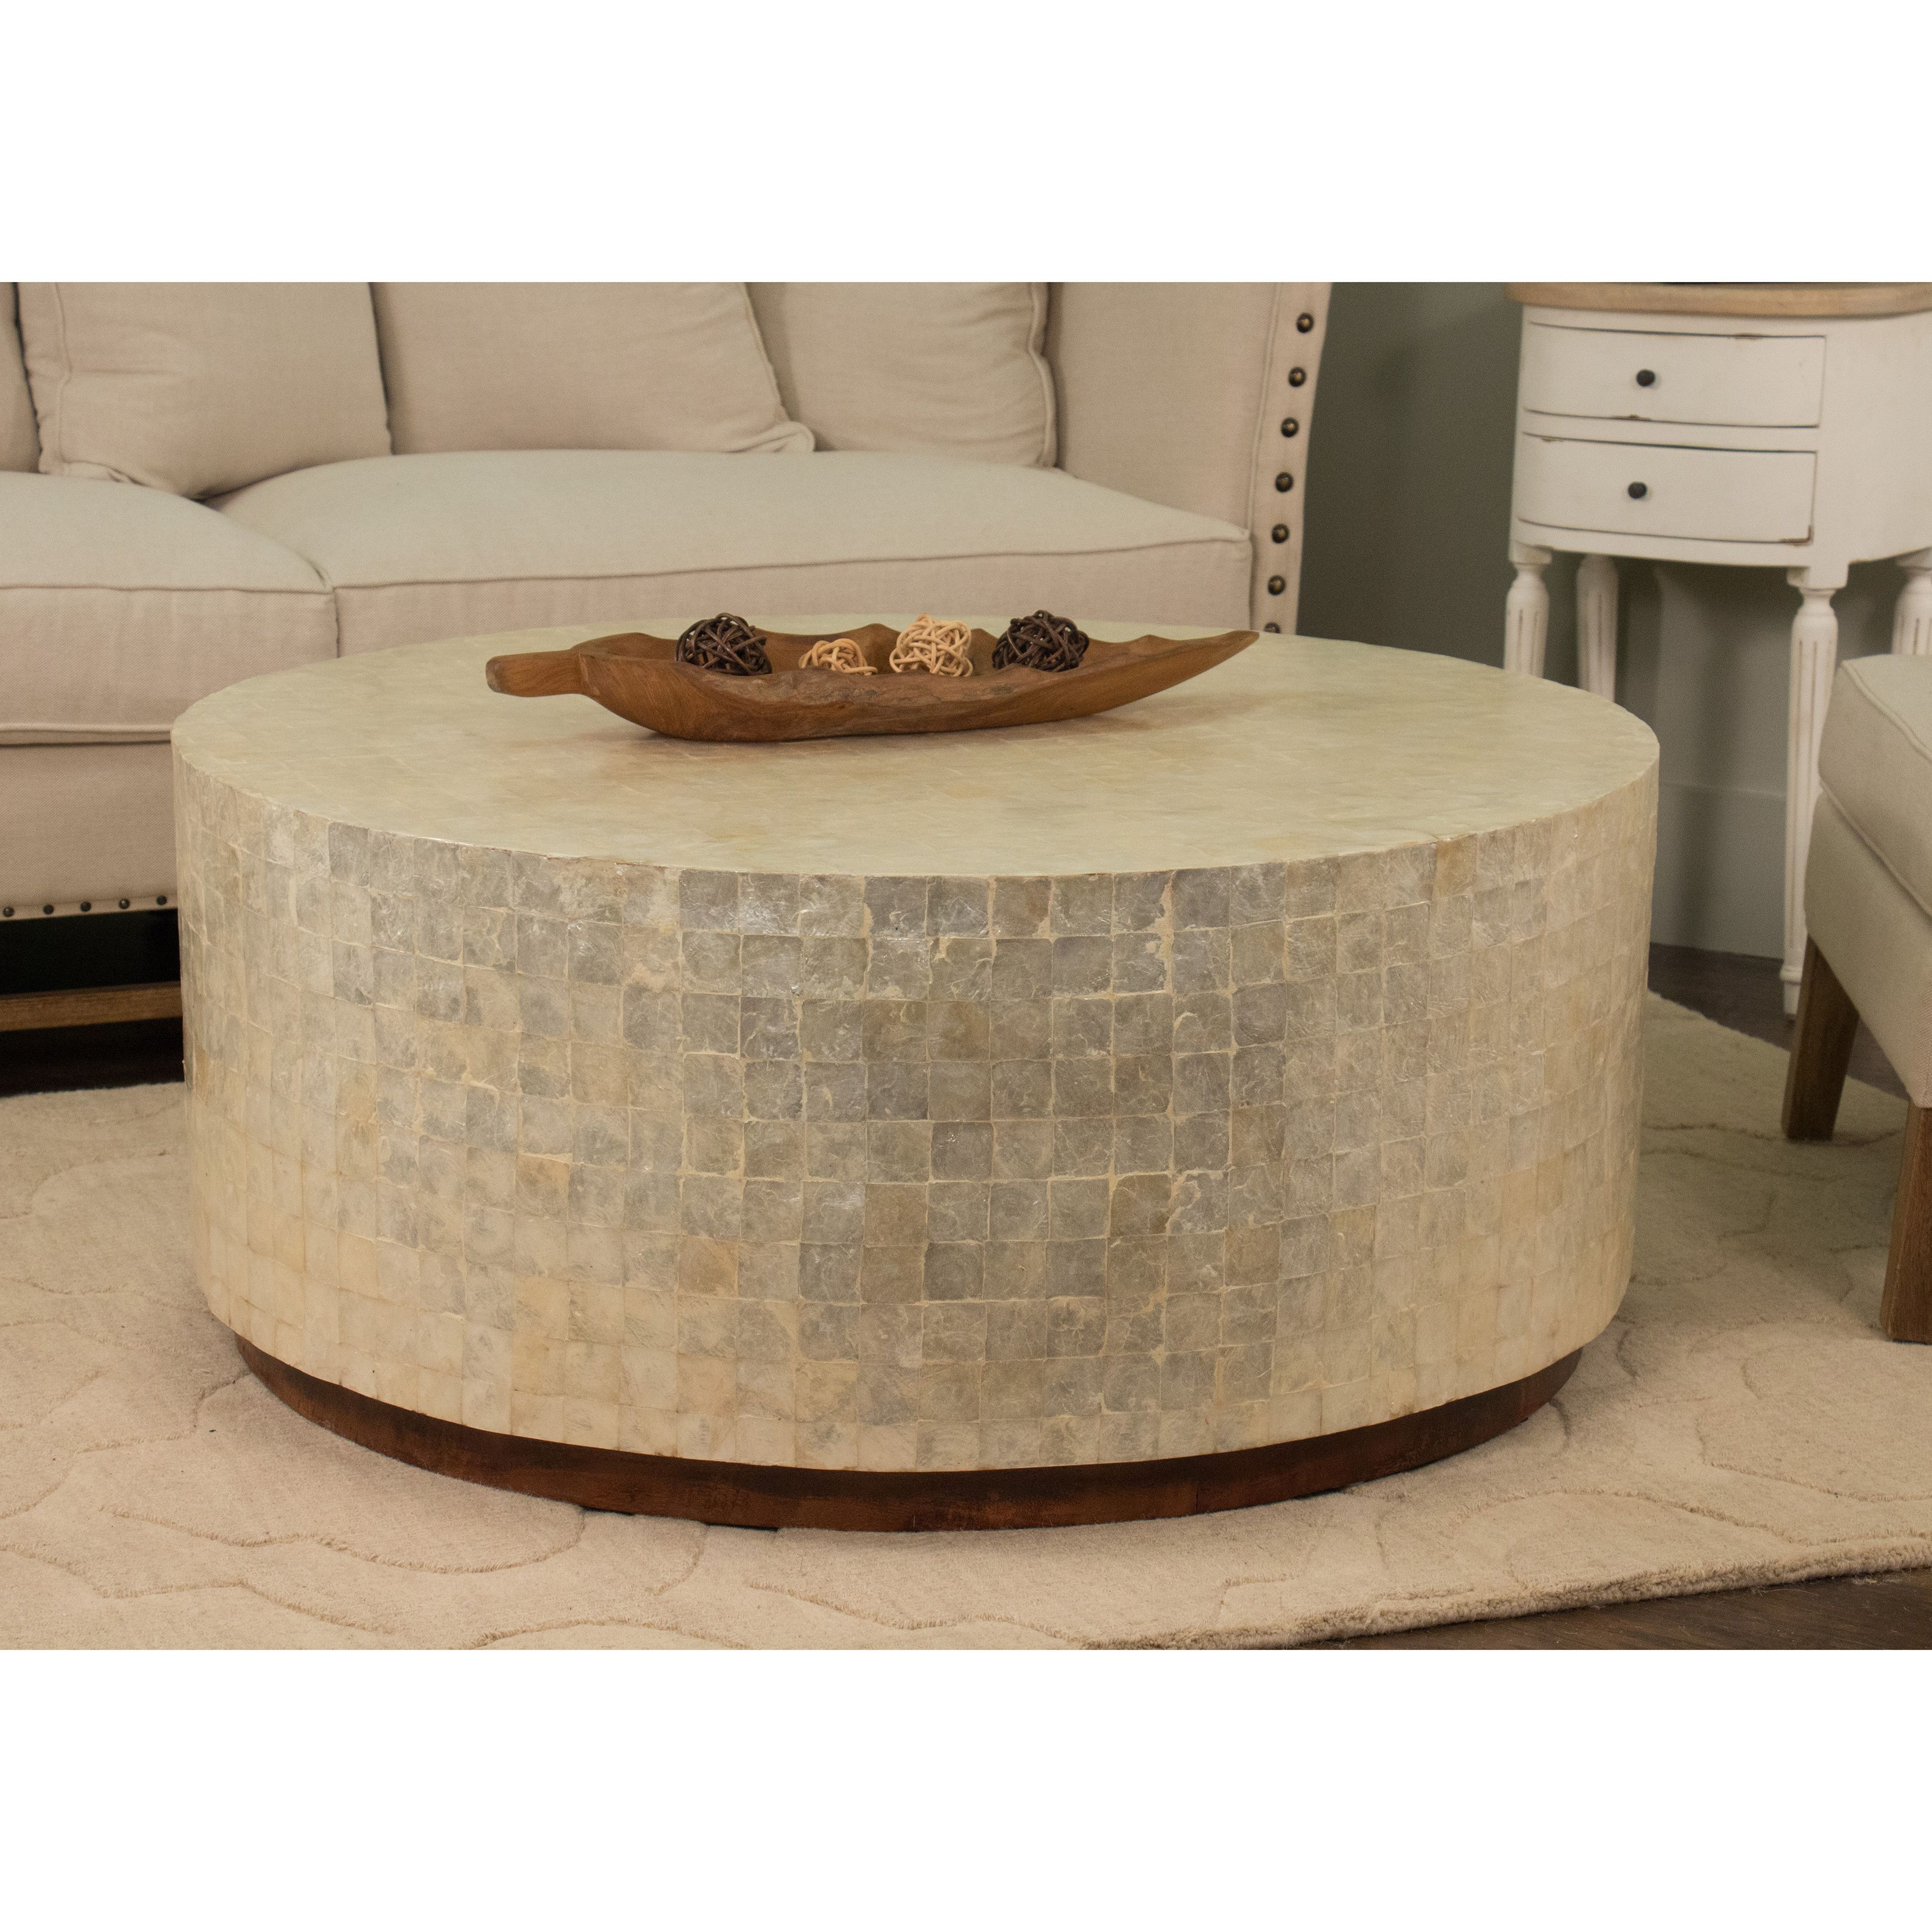 Round White Capiz Coffee Table: This Elegant Round Coffee Table Features Beautiful White